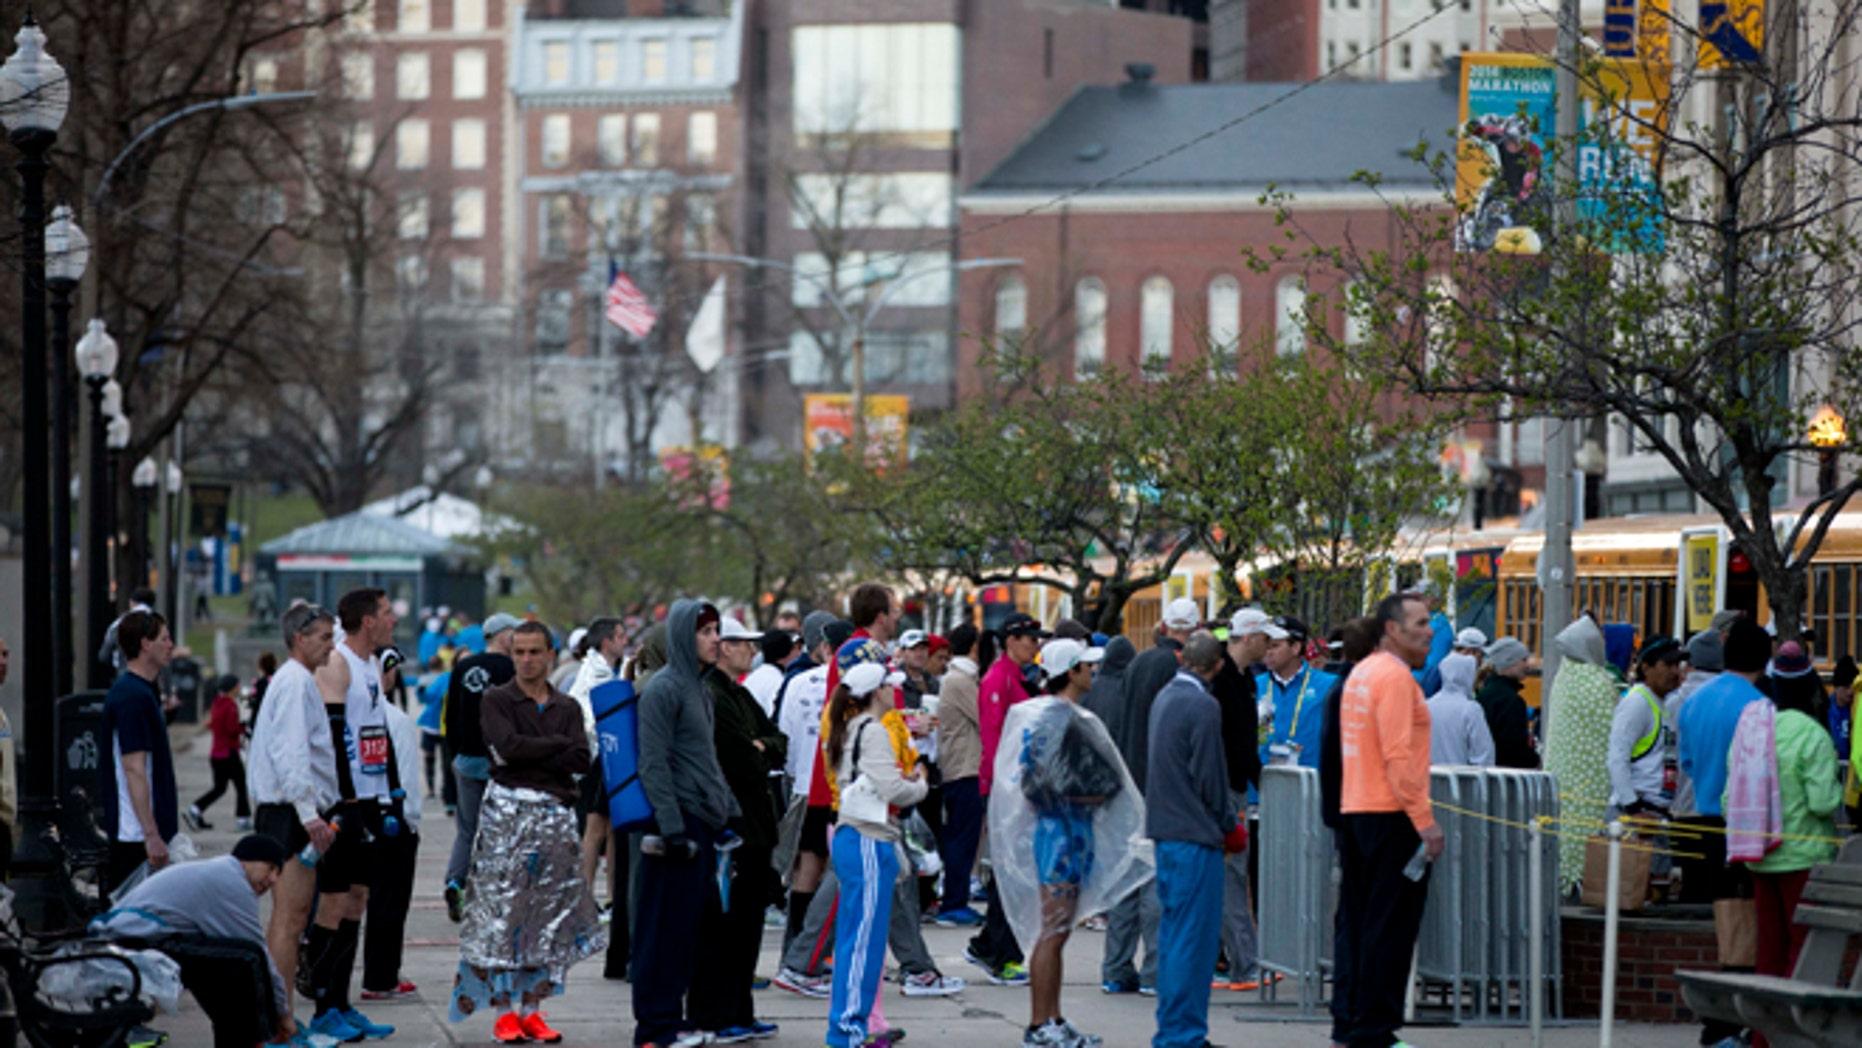 Runners cue to board busses ahead of the 118th Boston Marathon Monday, April 21, 2014 in Boston. (AP Photo/Matt Rourke)